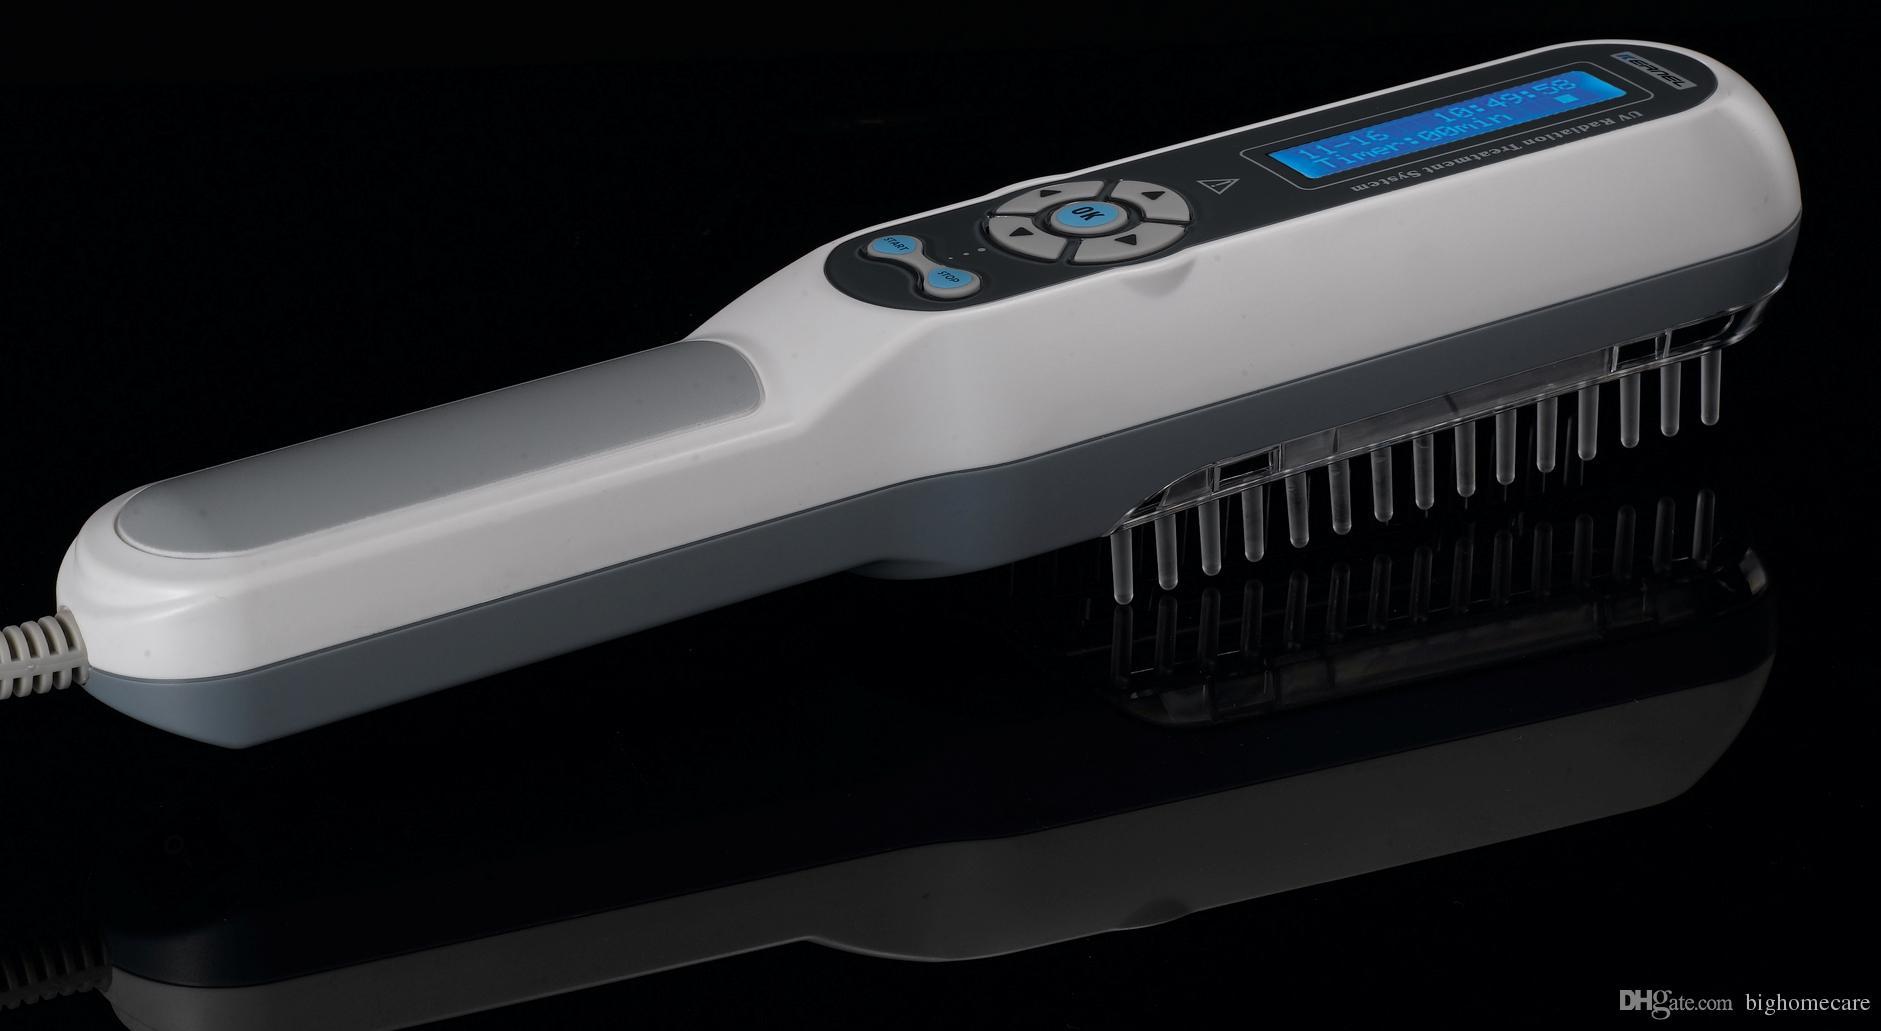 narrow band uvb lamps with comb for psoriasis vitiligo. Black Bedroom Furniture Sets. Home Design Ideas